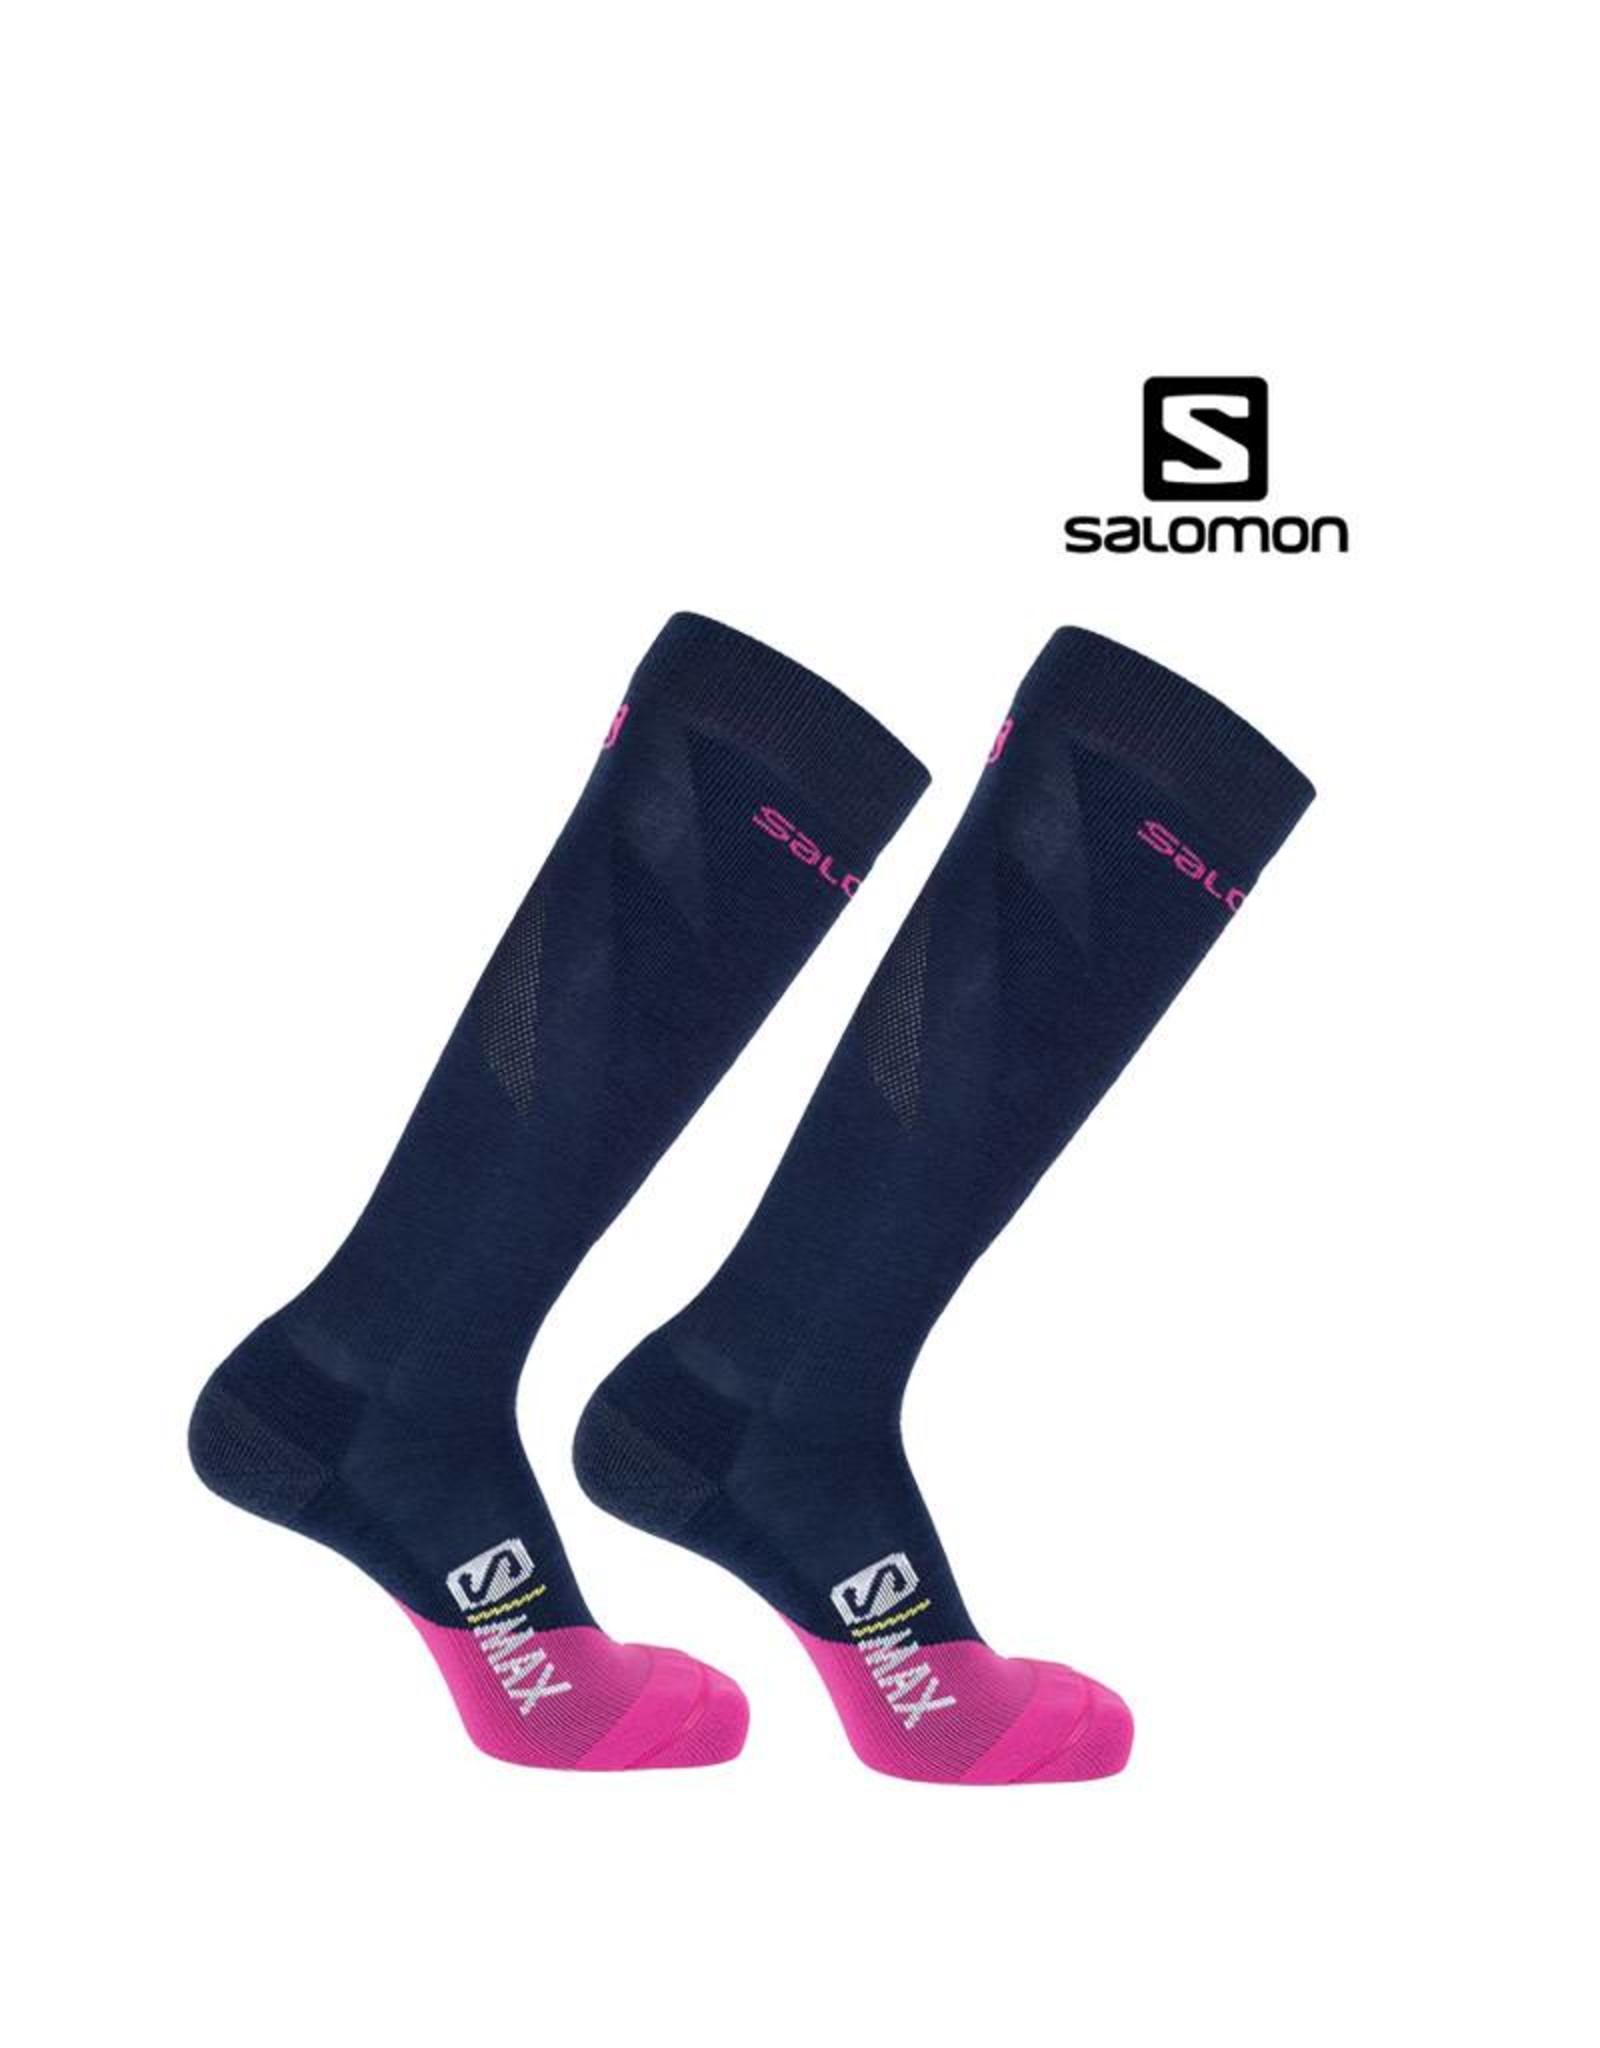 SALOMON SALOMON SKISOKKEN S/MAX Women Blauw/Roze 39-41